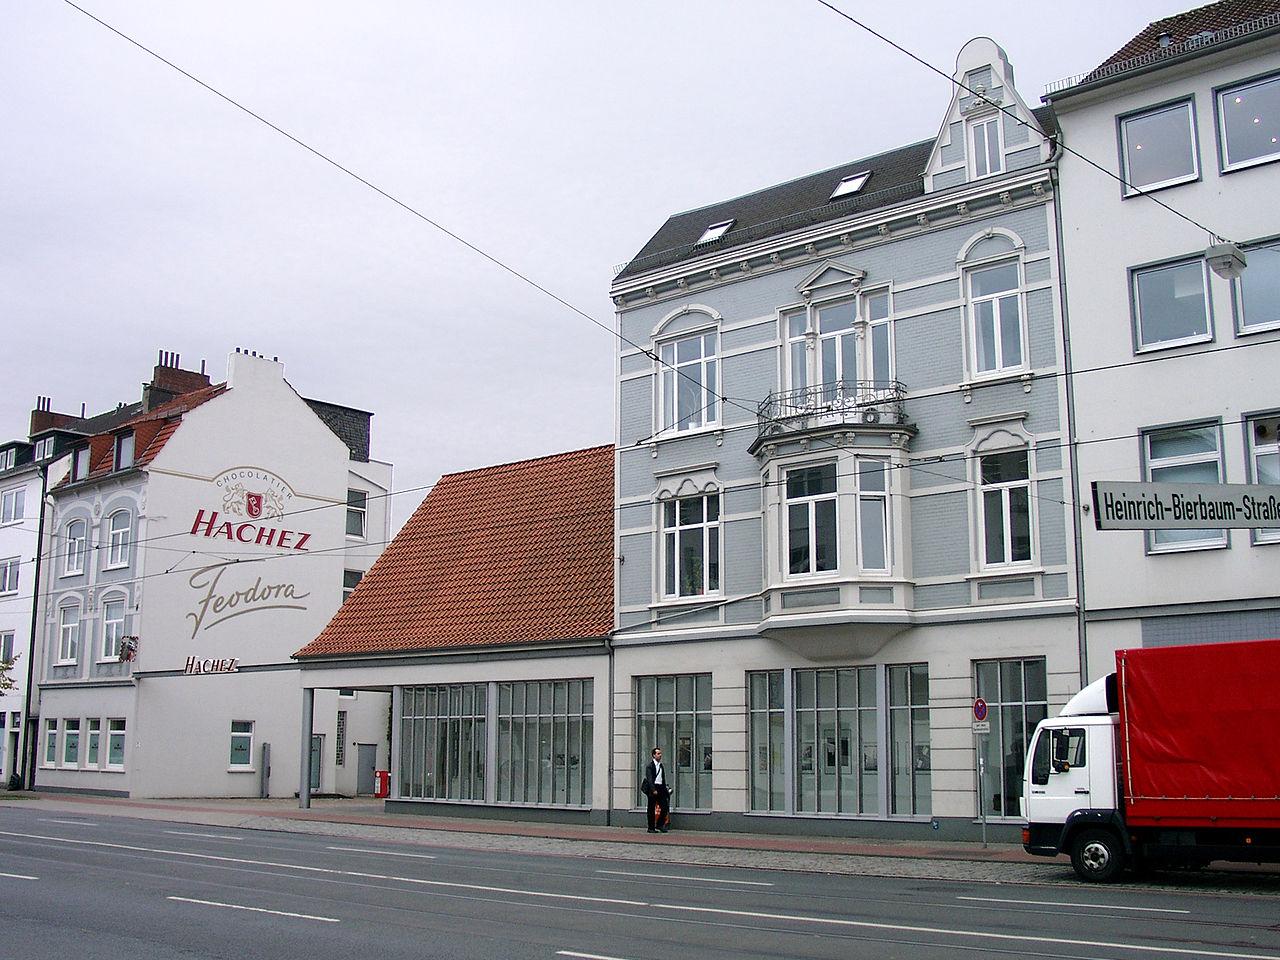 Bild HACHEZ Chocolade Bremen